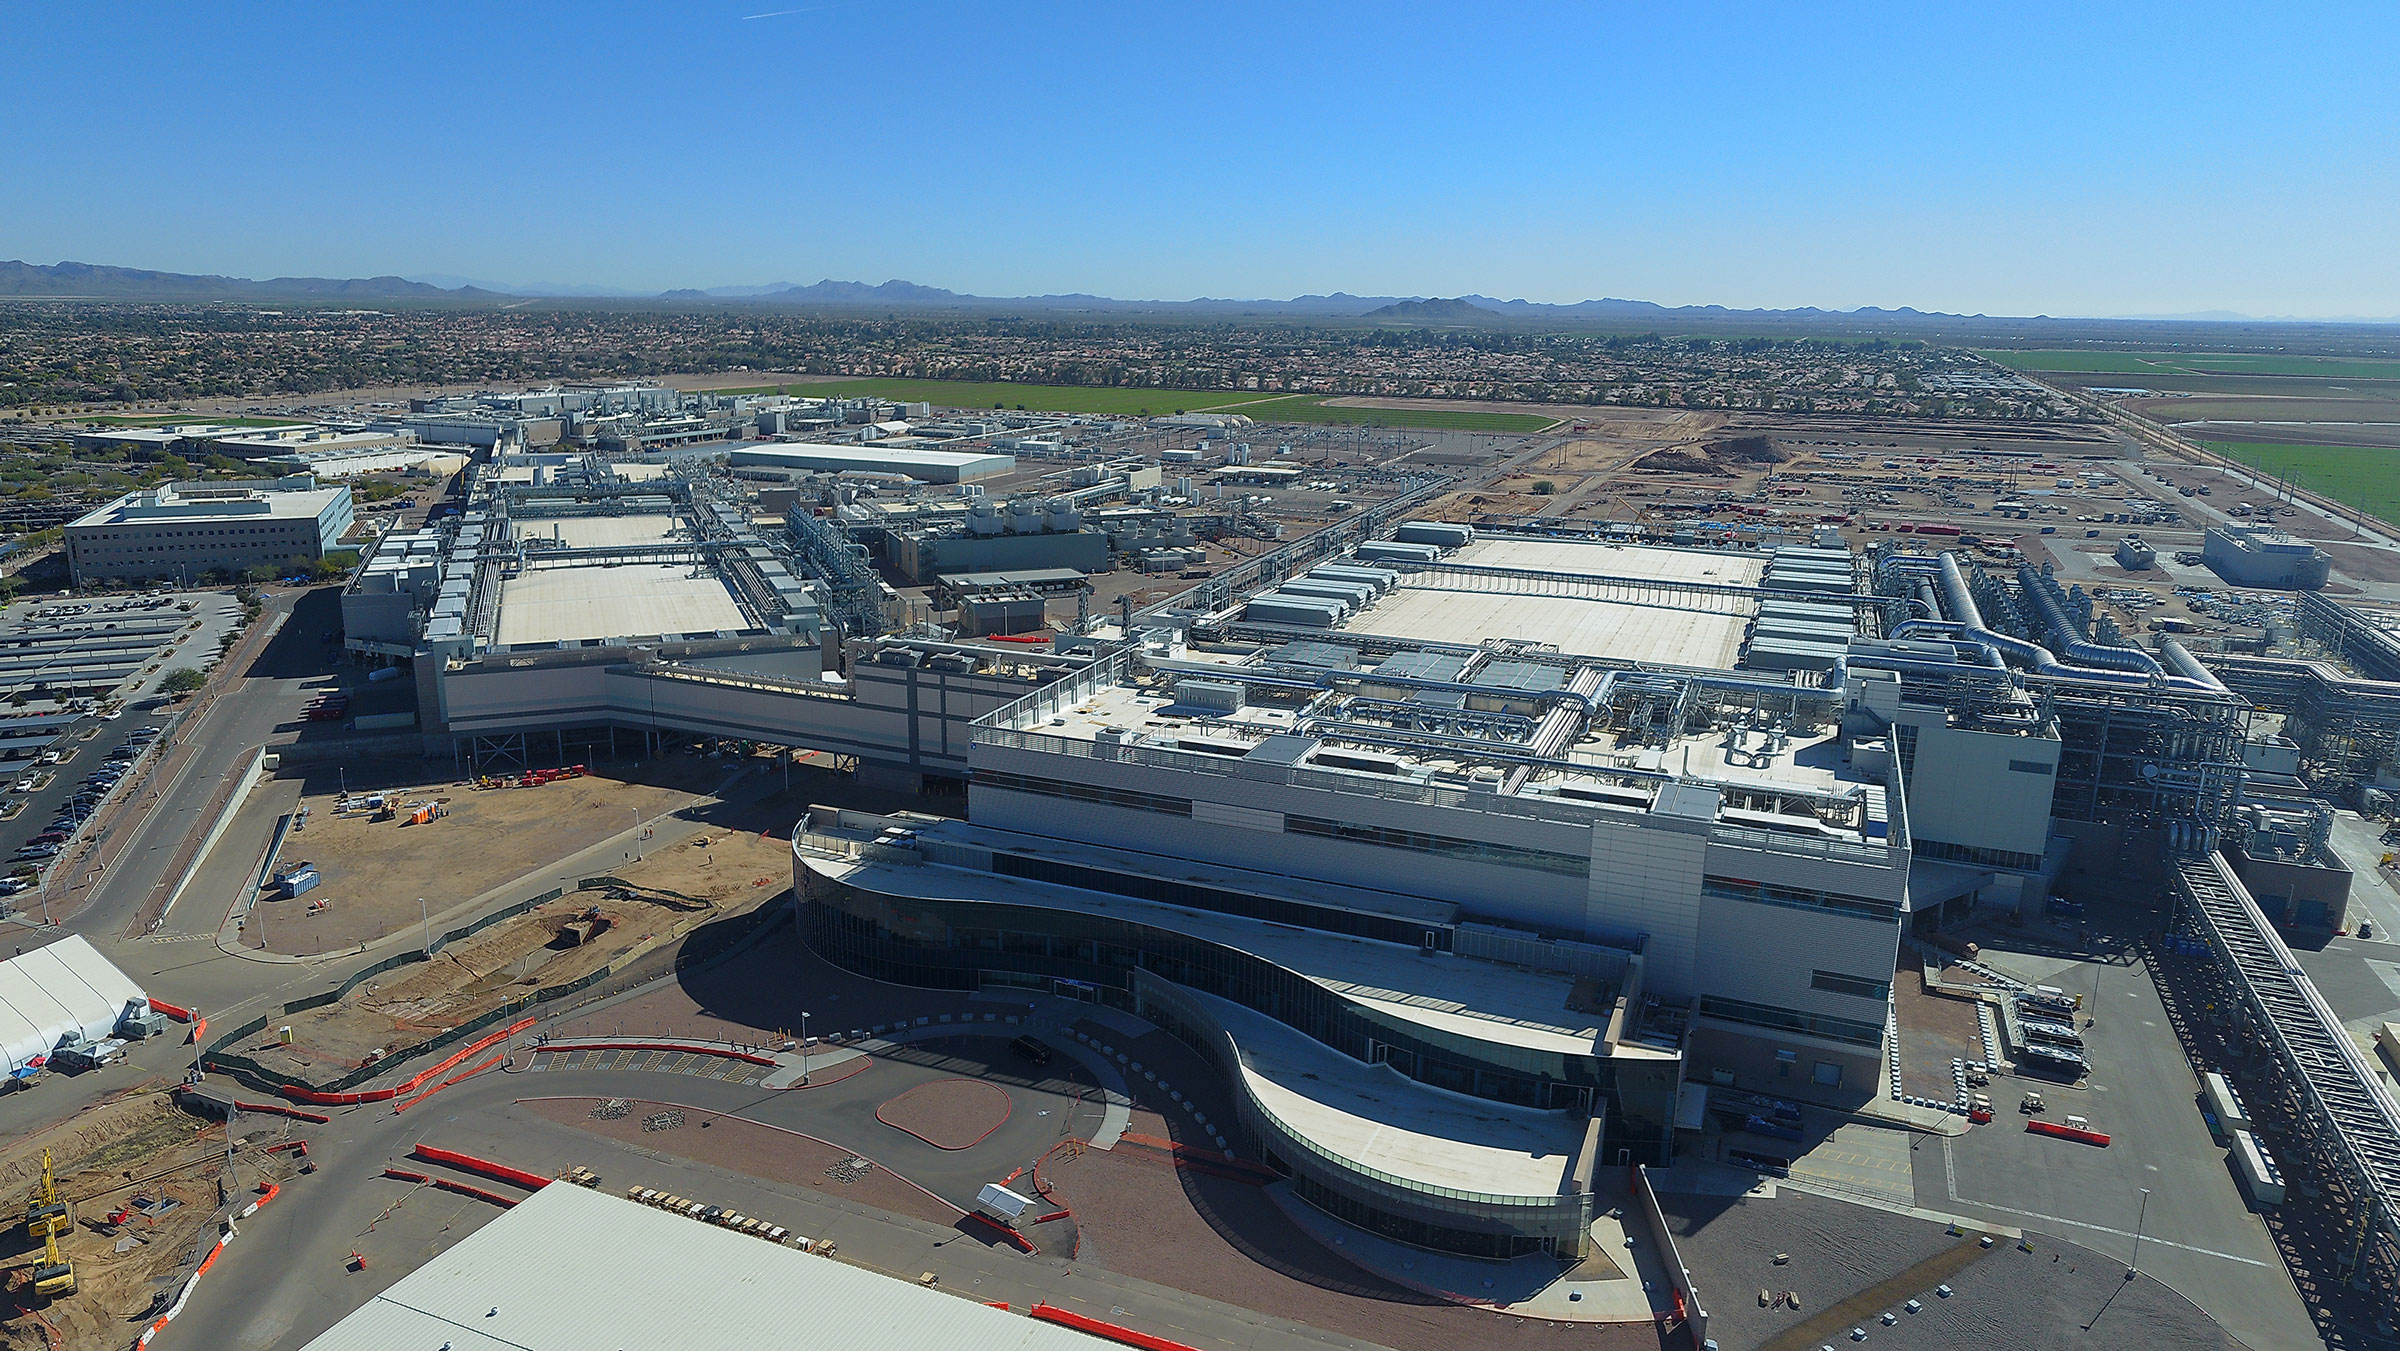 Aerial view of Intel fab plant